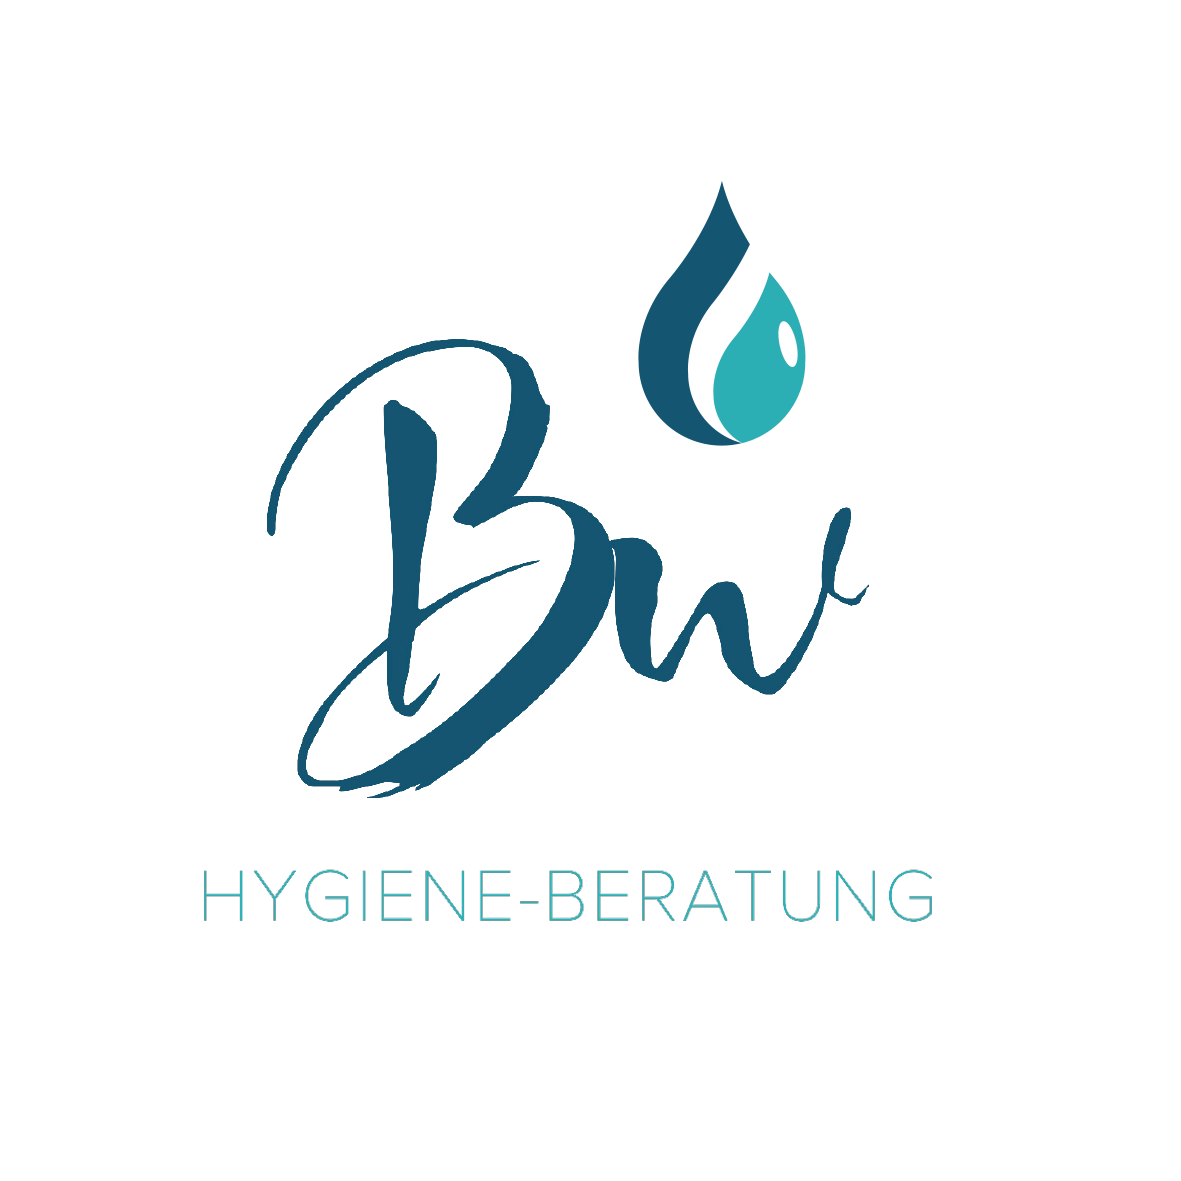 https://gollners.de/wp-content/uploads/2020/10/Logo_BW_Hygieneberatung.png